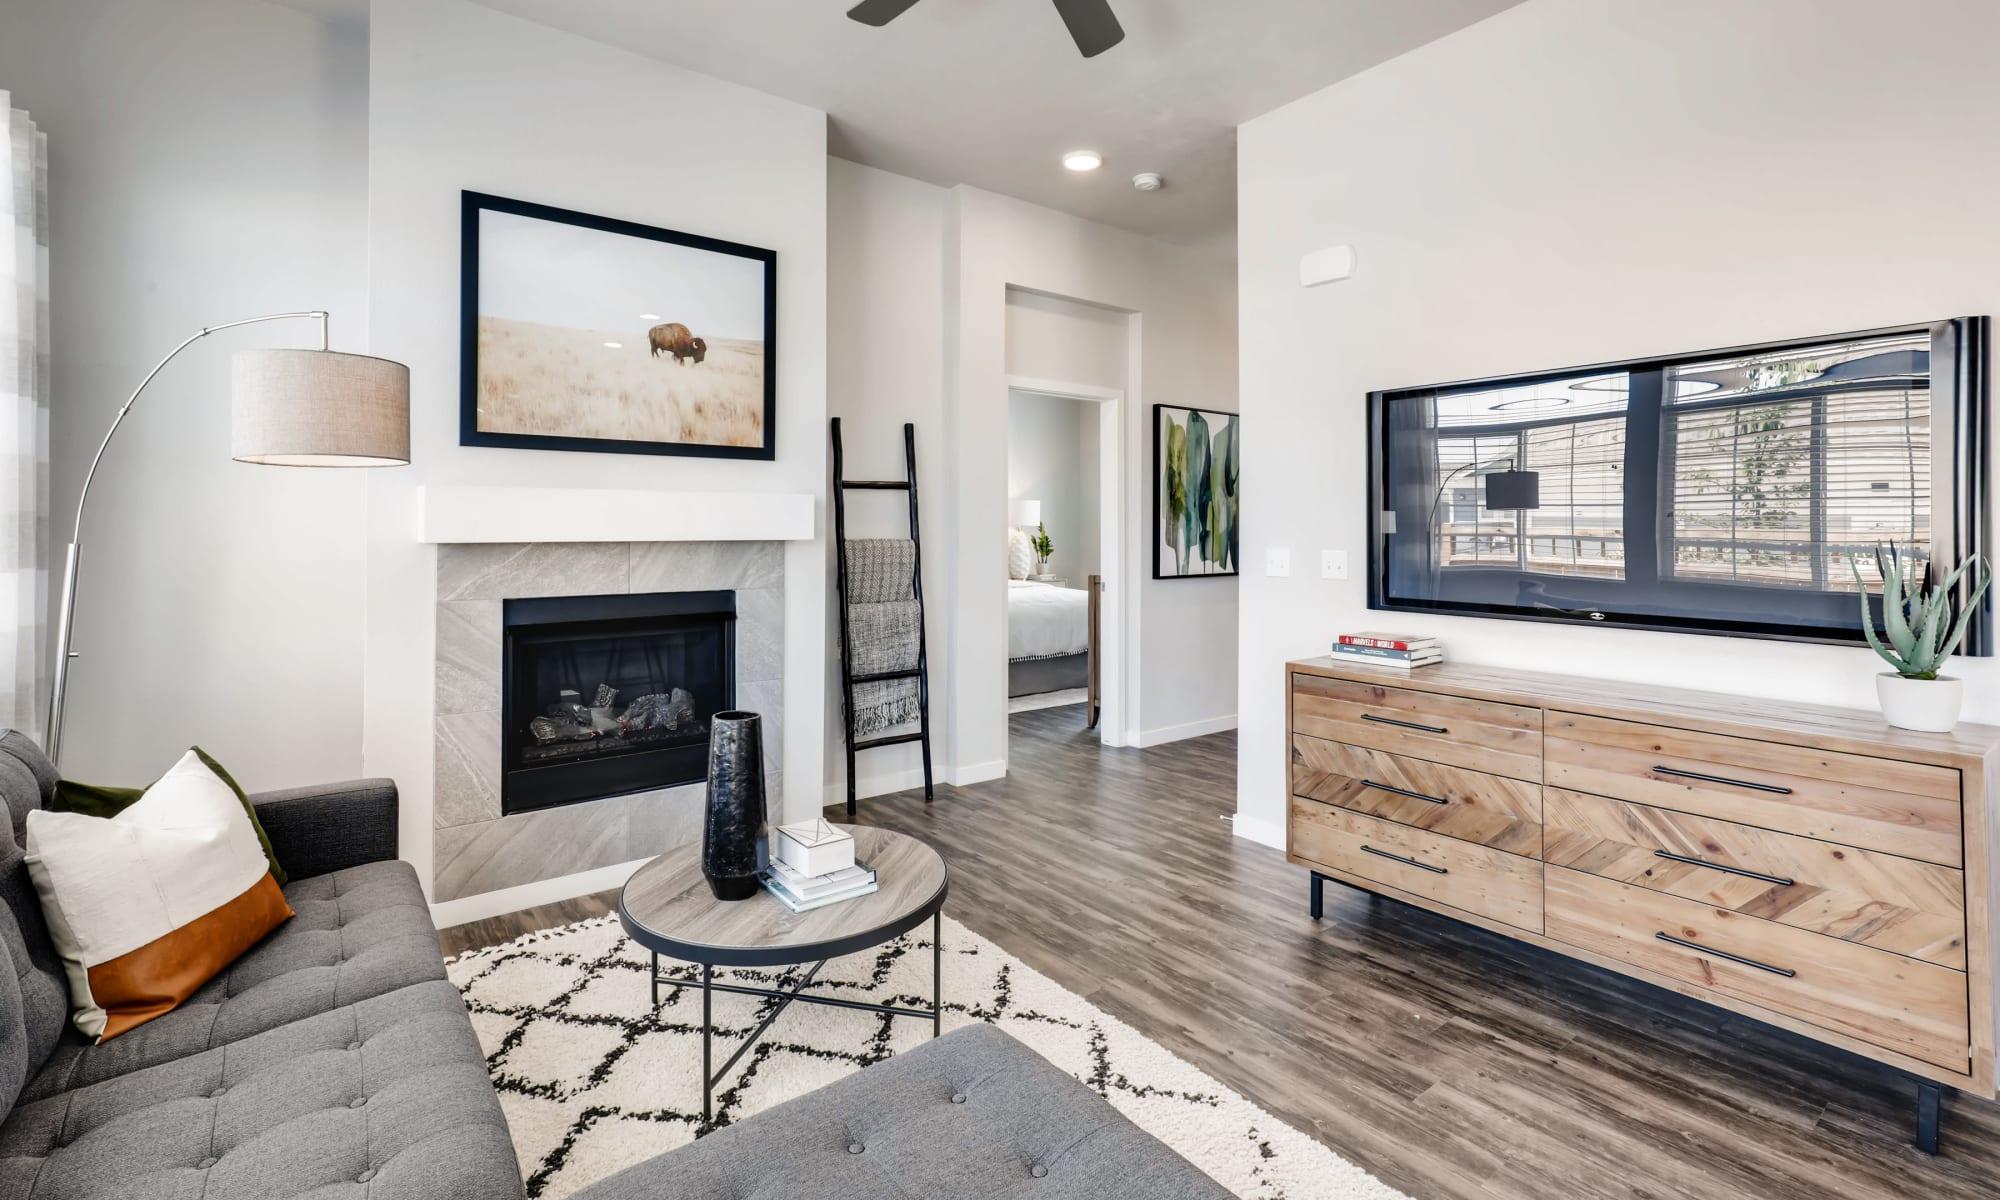 Avilla Eastlake apartments in Thornton, Colorado